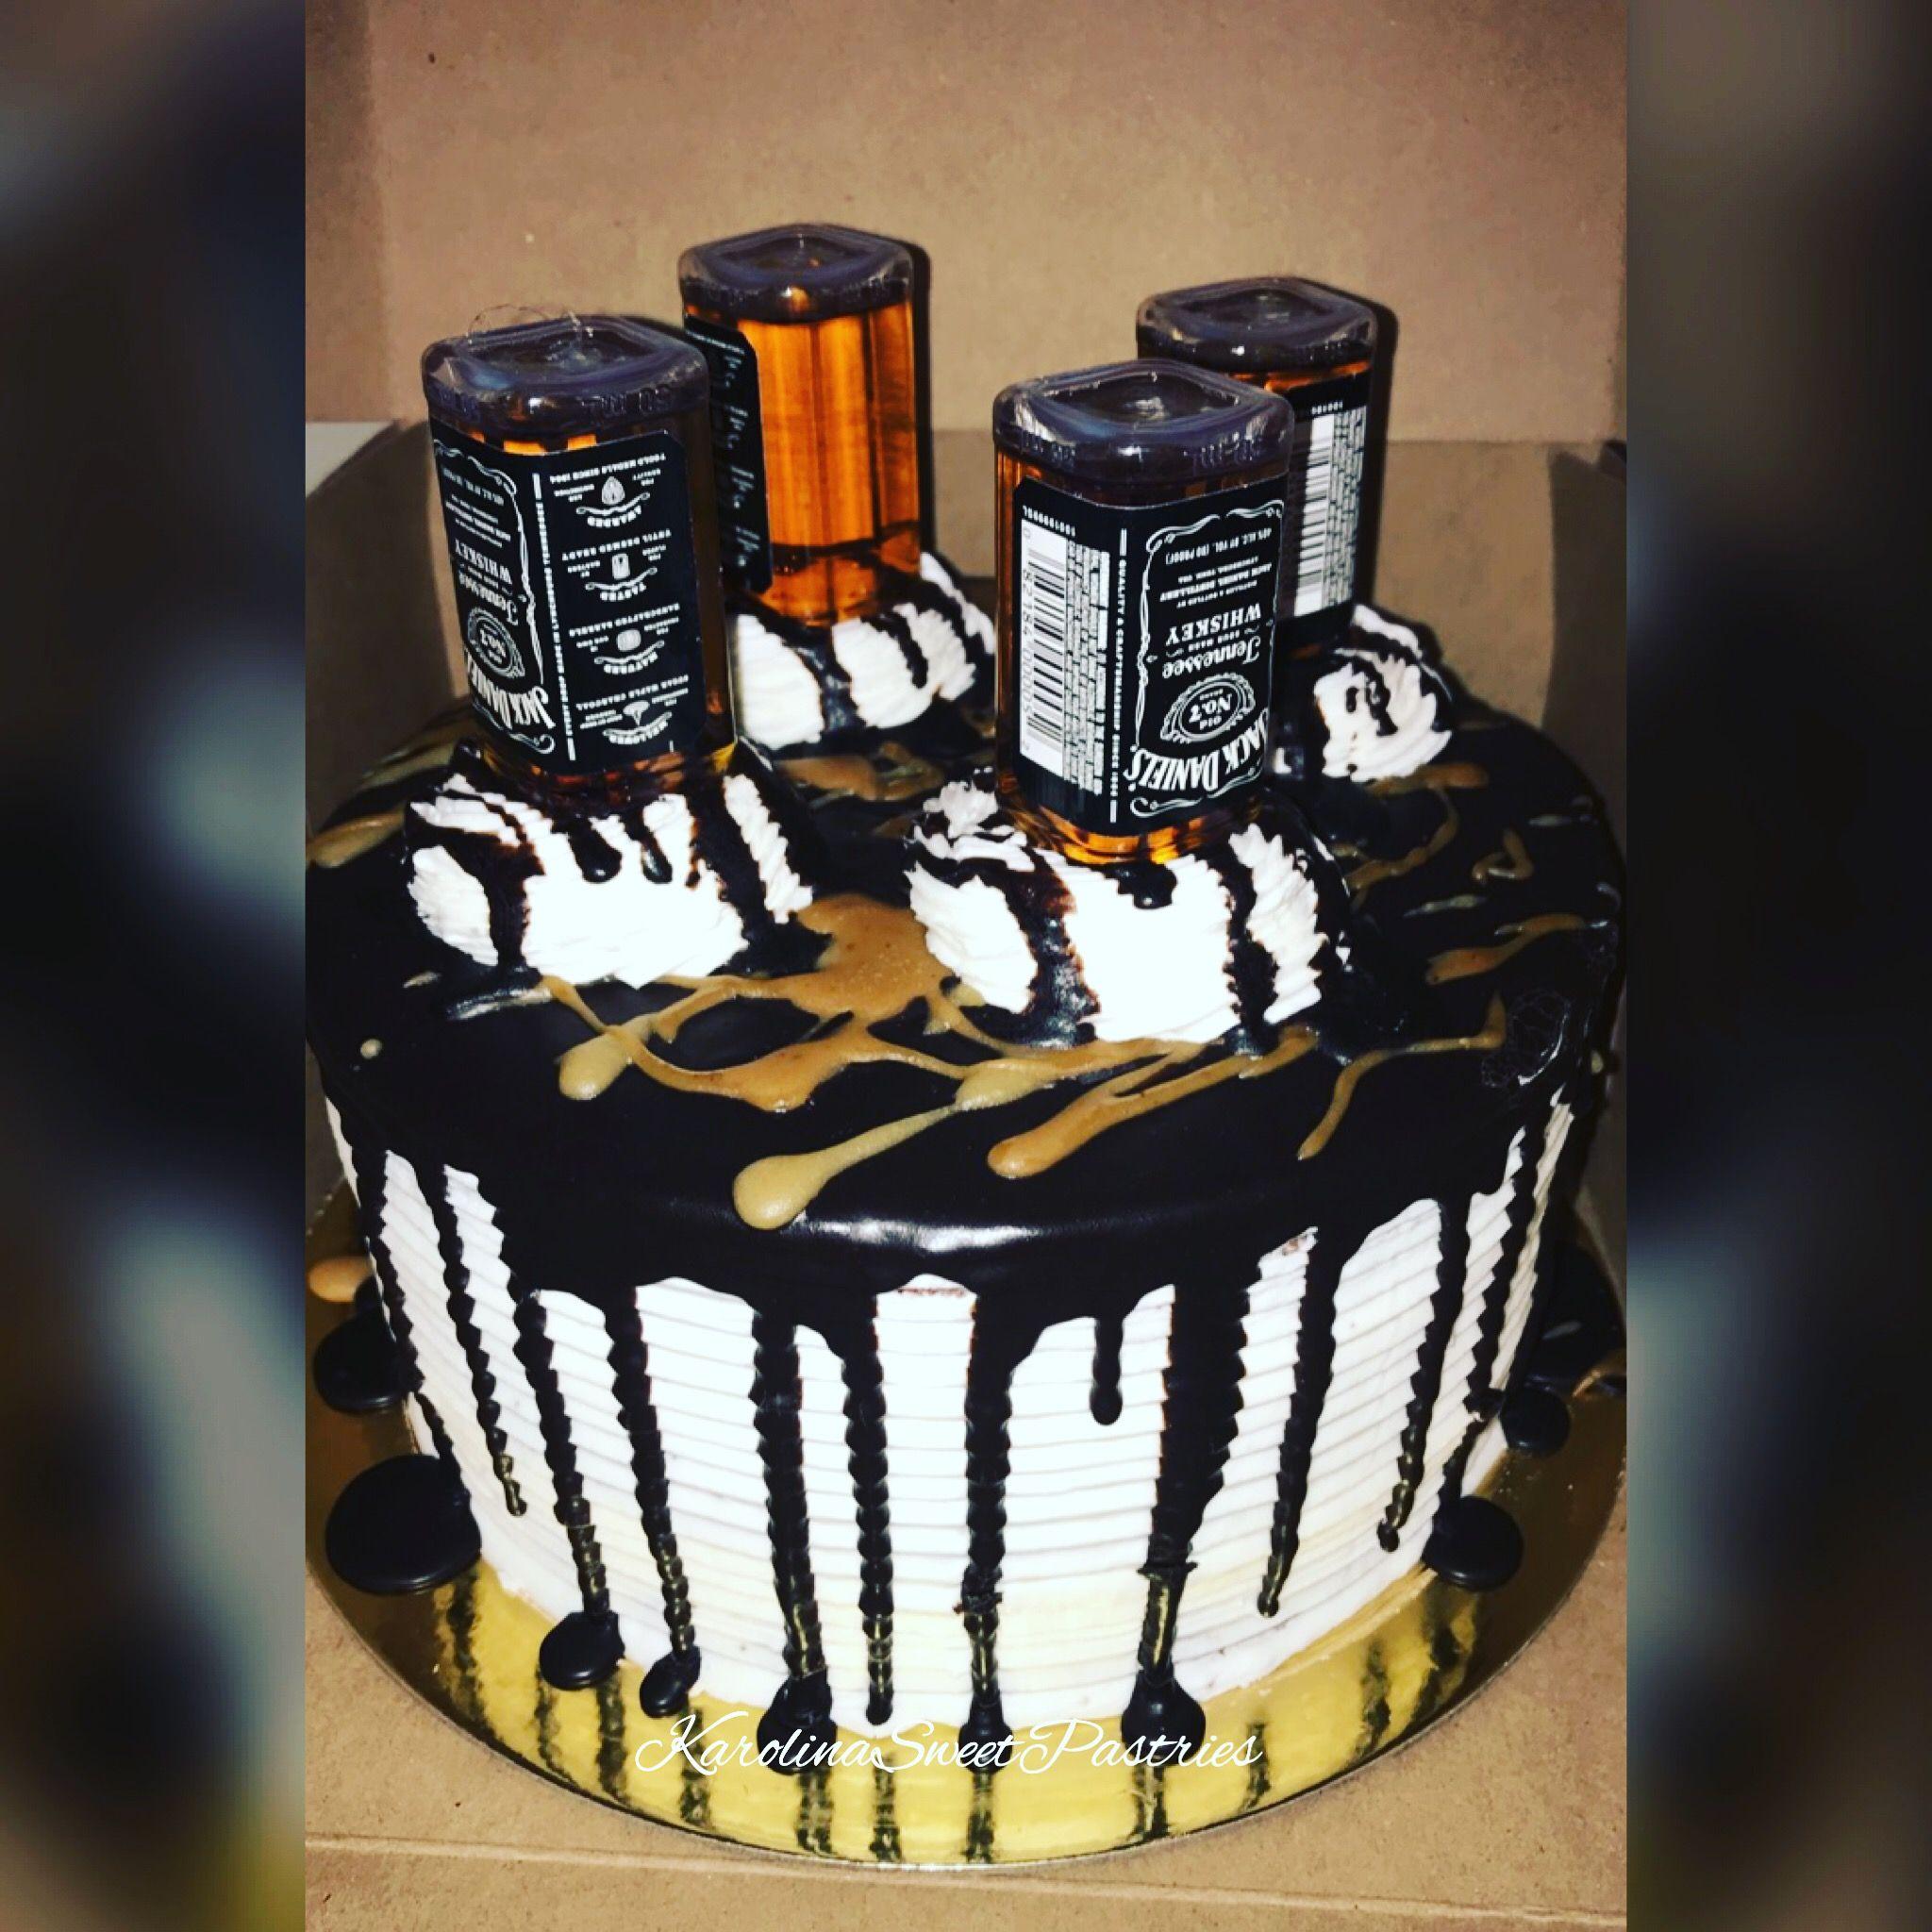 Jack Daniels Drip Cake Ganache Buttercream Chocolate Liquor Cake Birthday Liquor Cake Bottle Cake Sweet Pastries